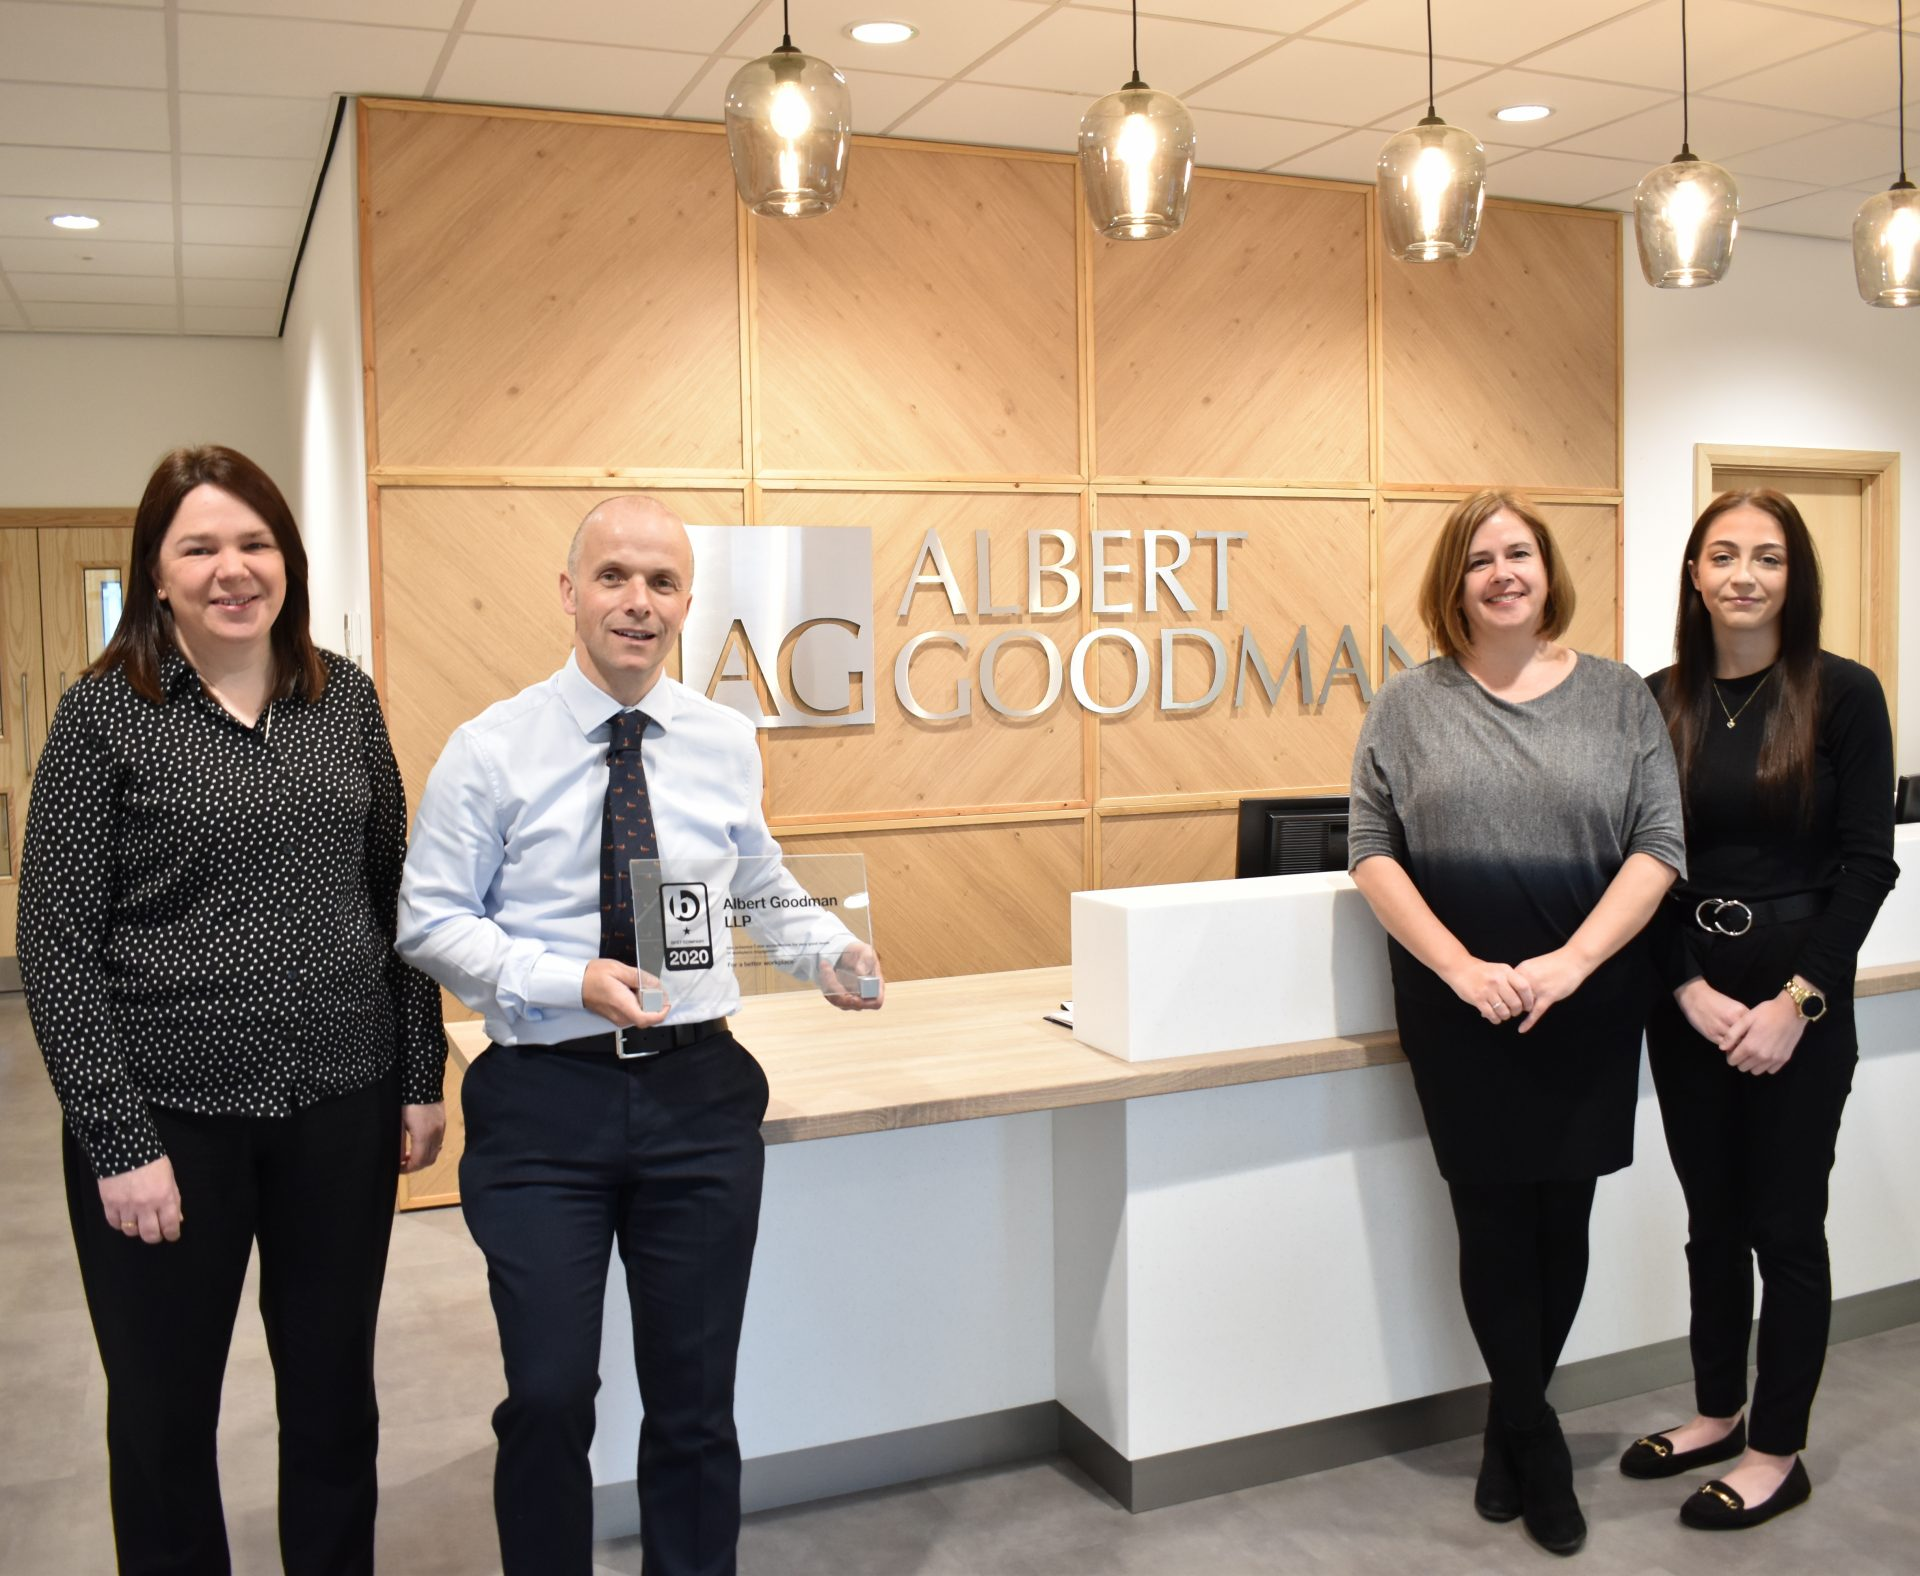 Albert Goodman Human Resources Award - Somerset Accountancy Services